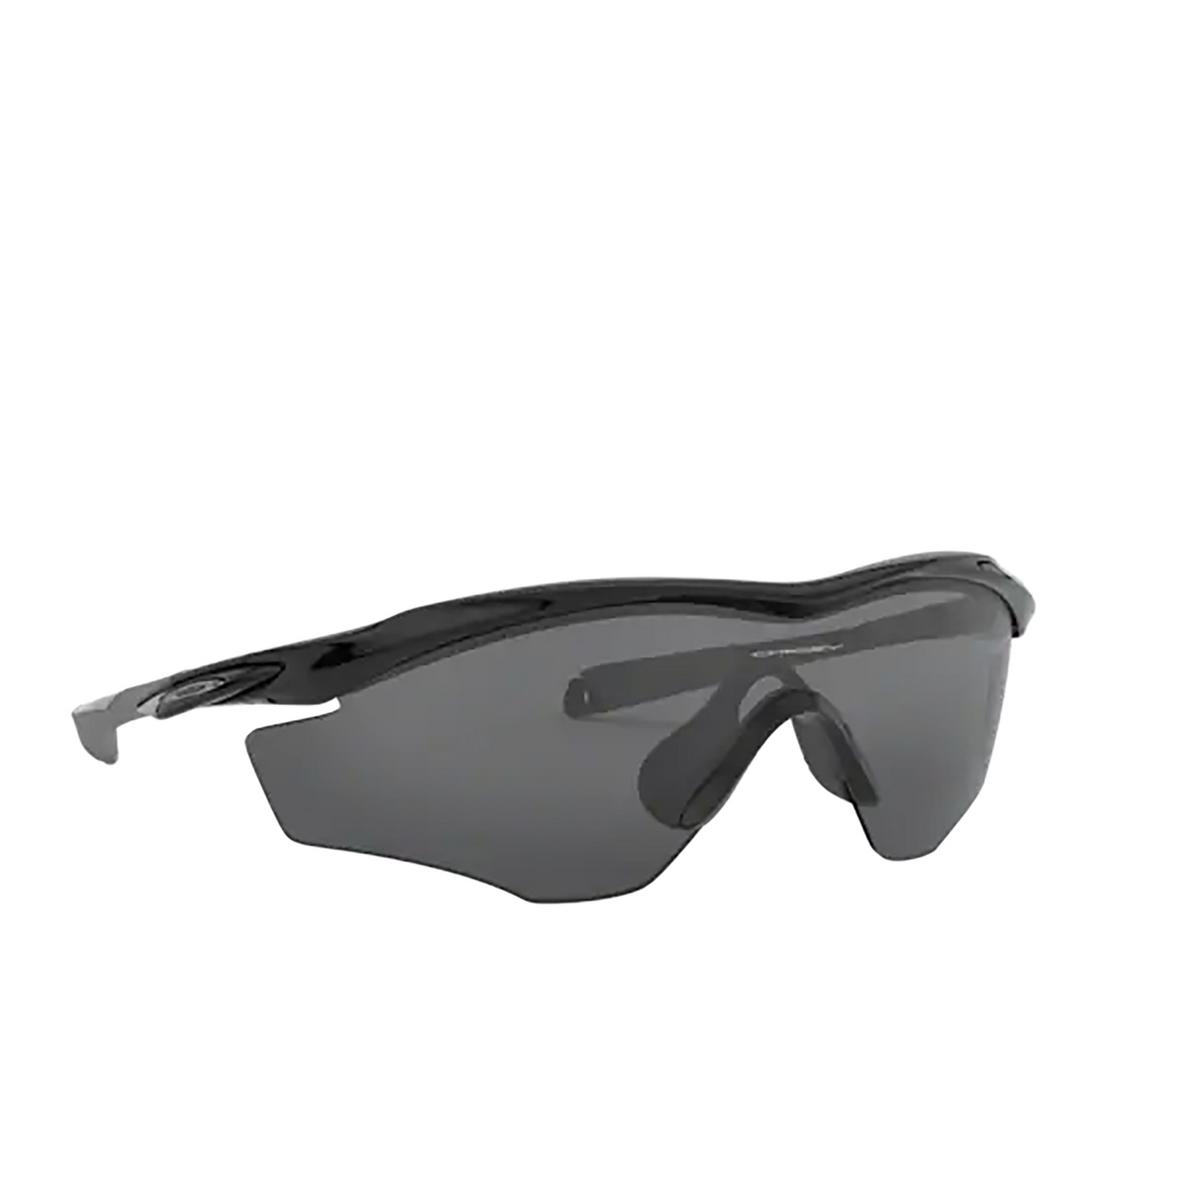 Oakley® Irregular Sunglasses: M2 Frame Xl OO9343 color Polished Black 934301 - three-quarters view.